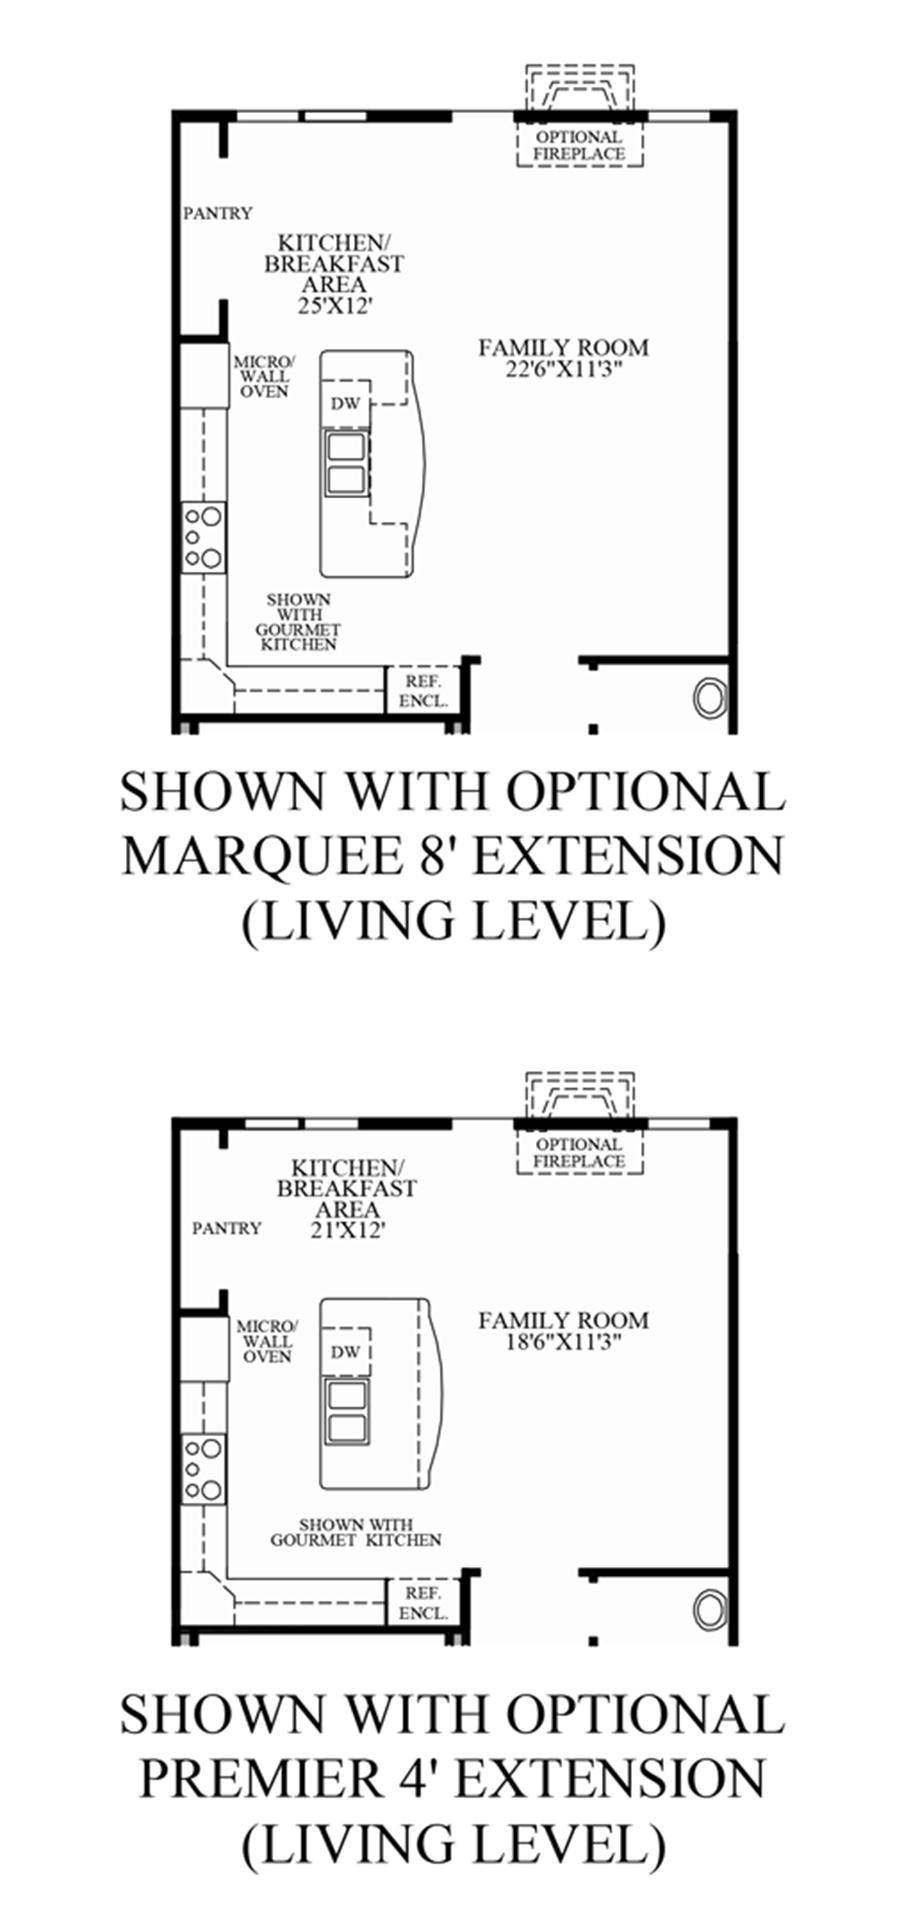 Optional Living Level Extensions (Living Level Entry) Floor Plan